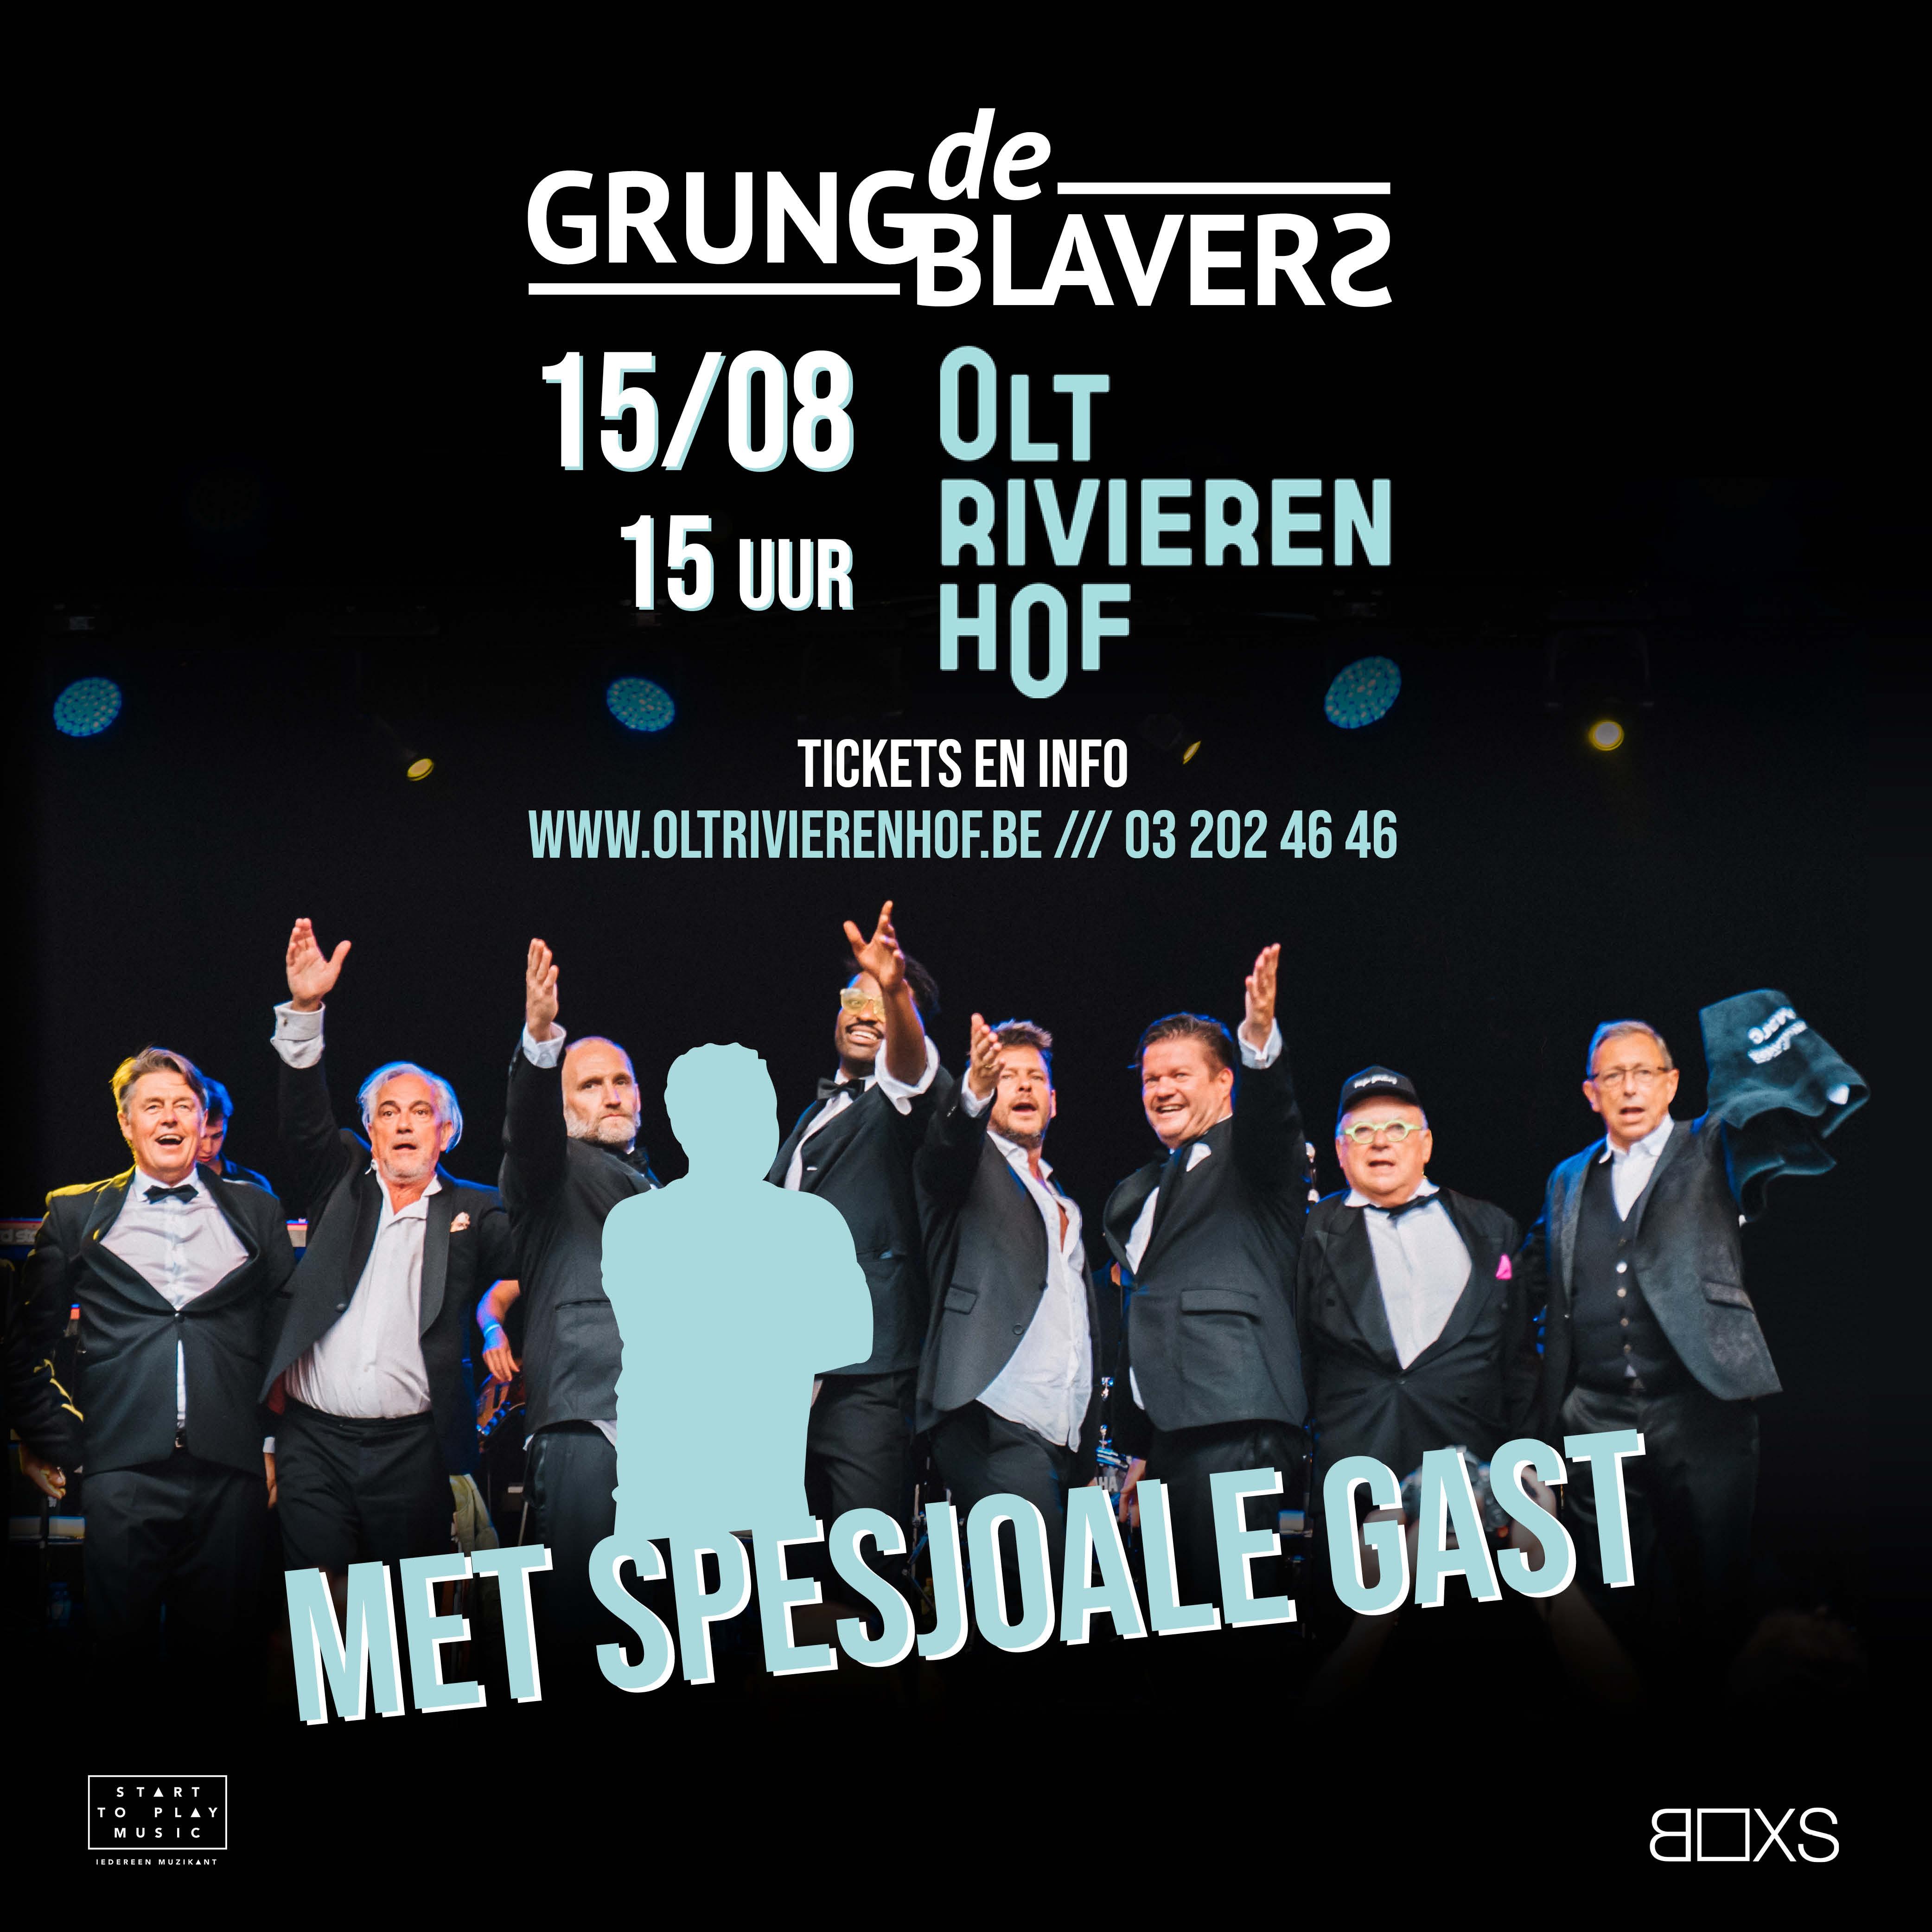 De Grungblavers, Special Guest, OLT